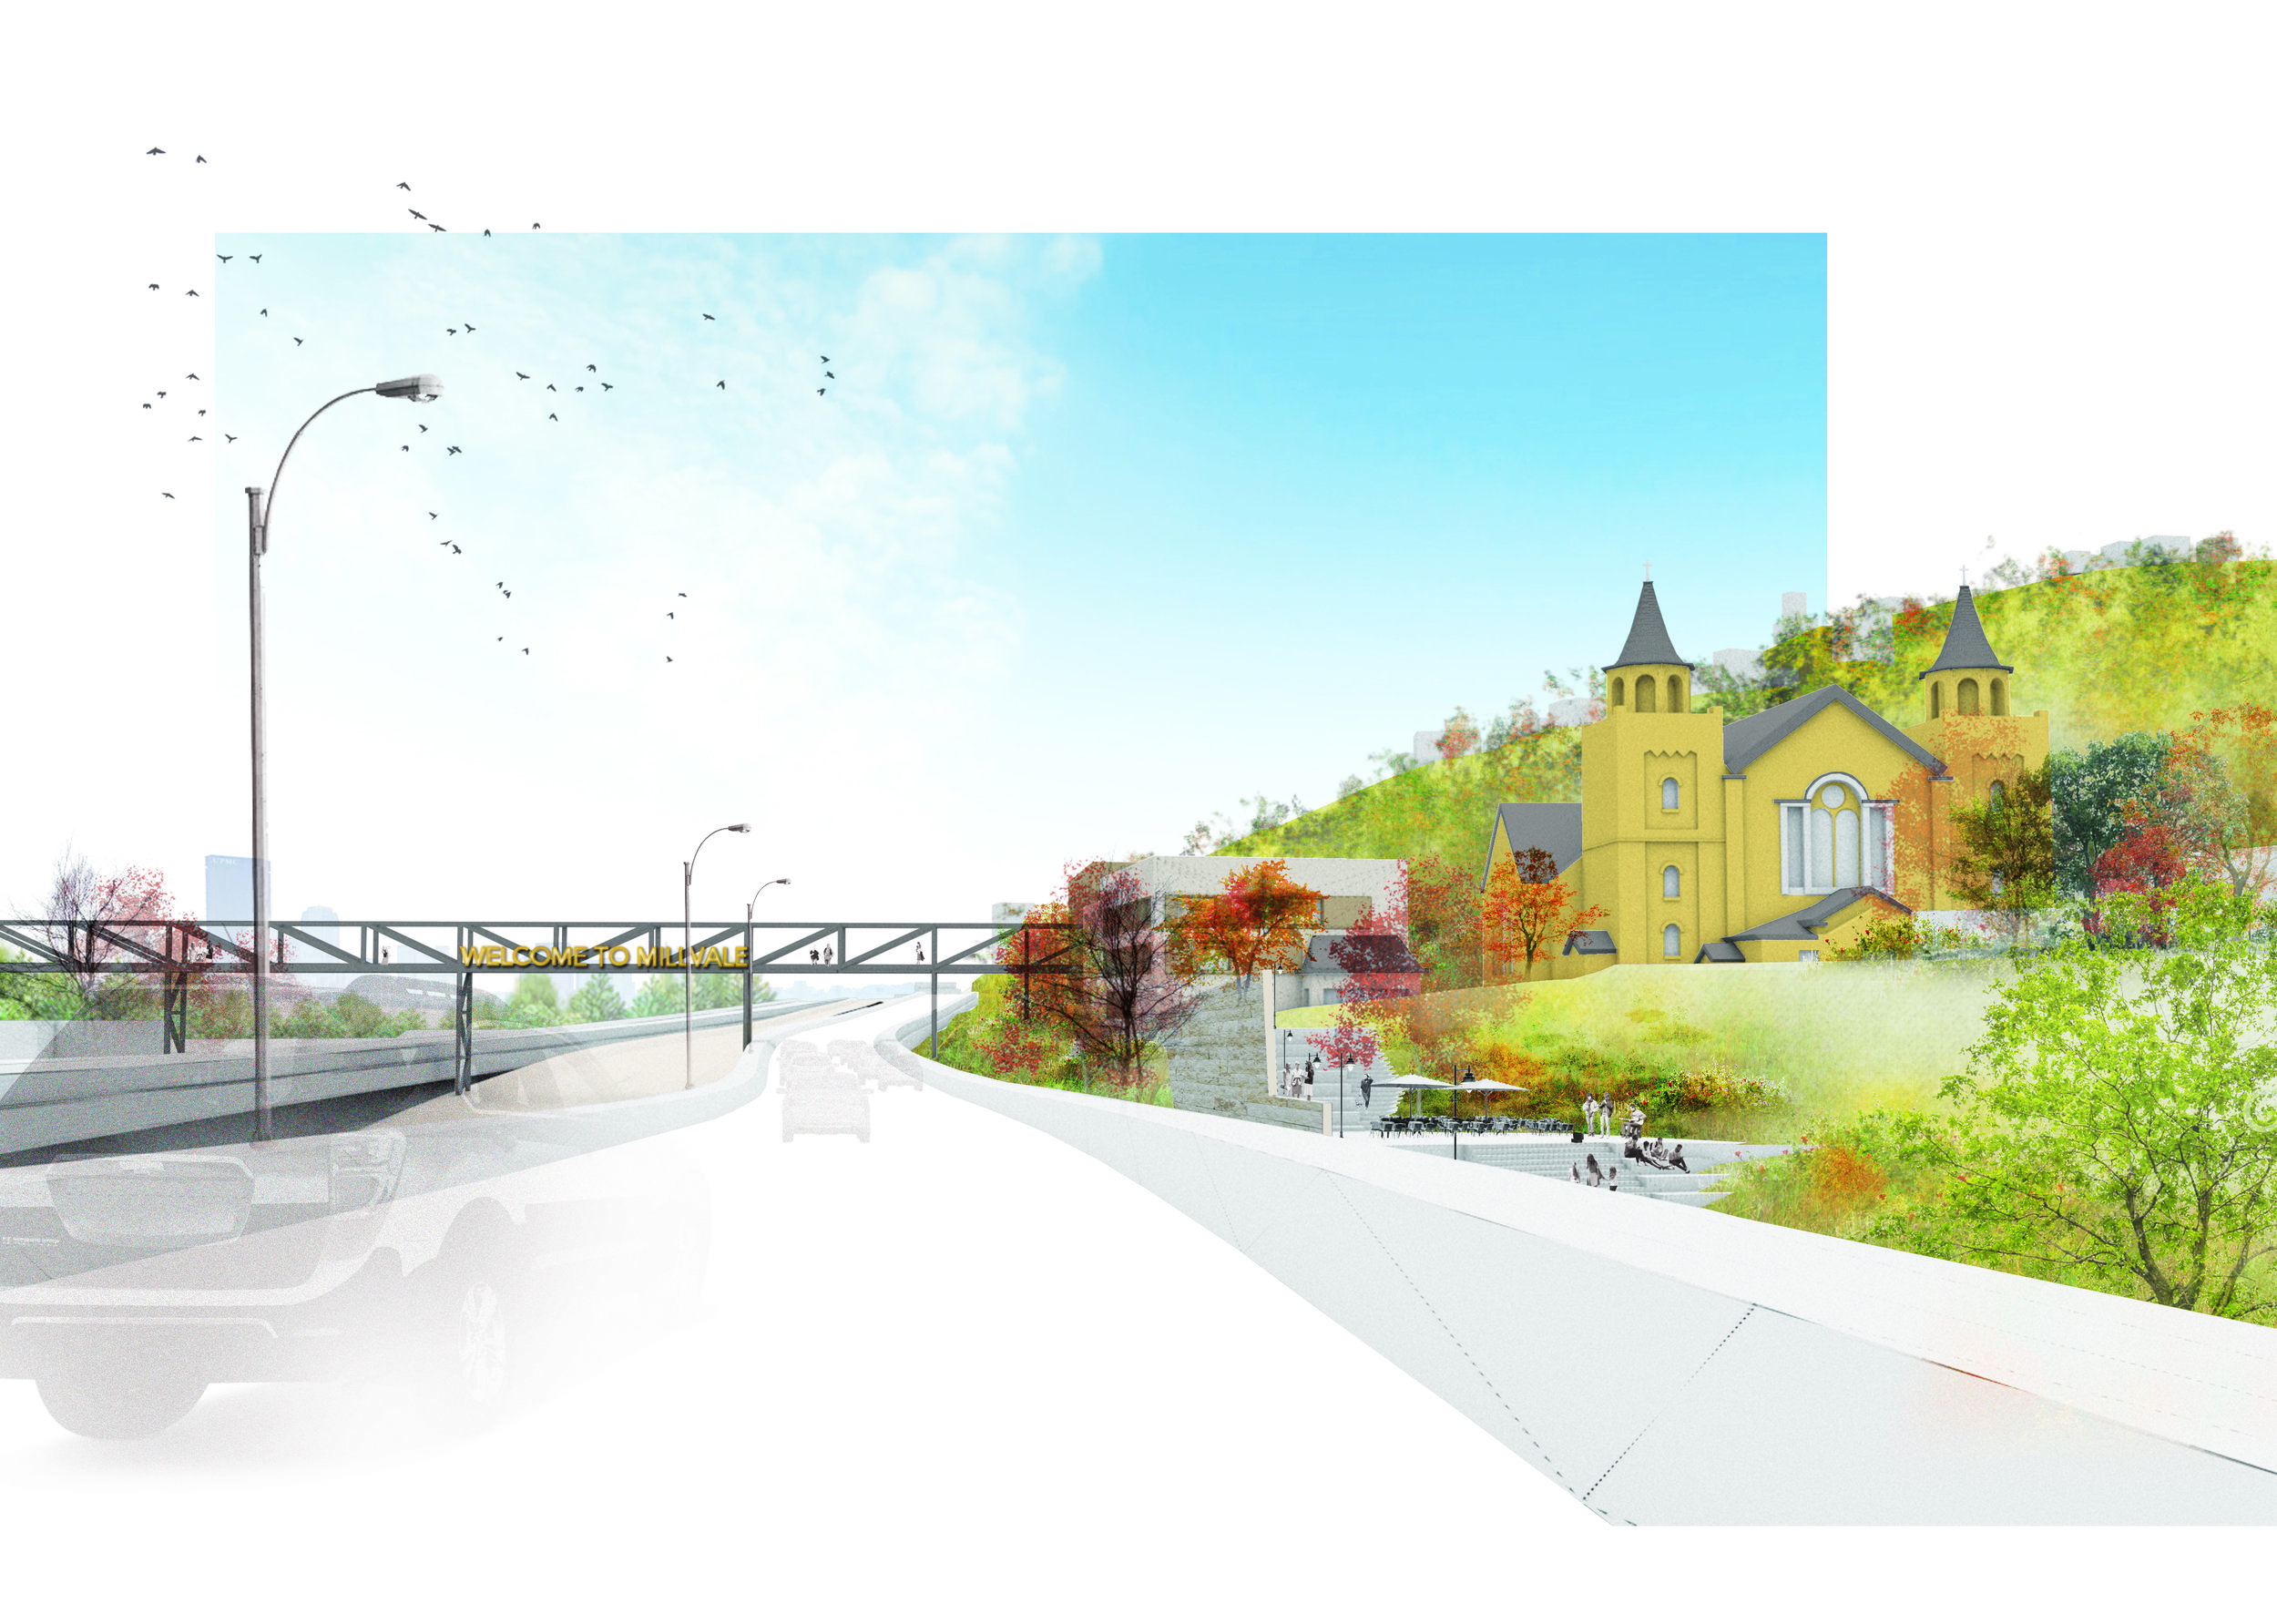 1204_render-lookout bridge-002.jpg